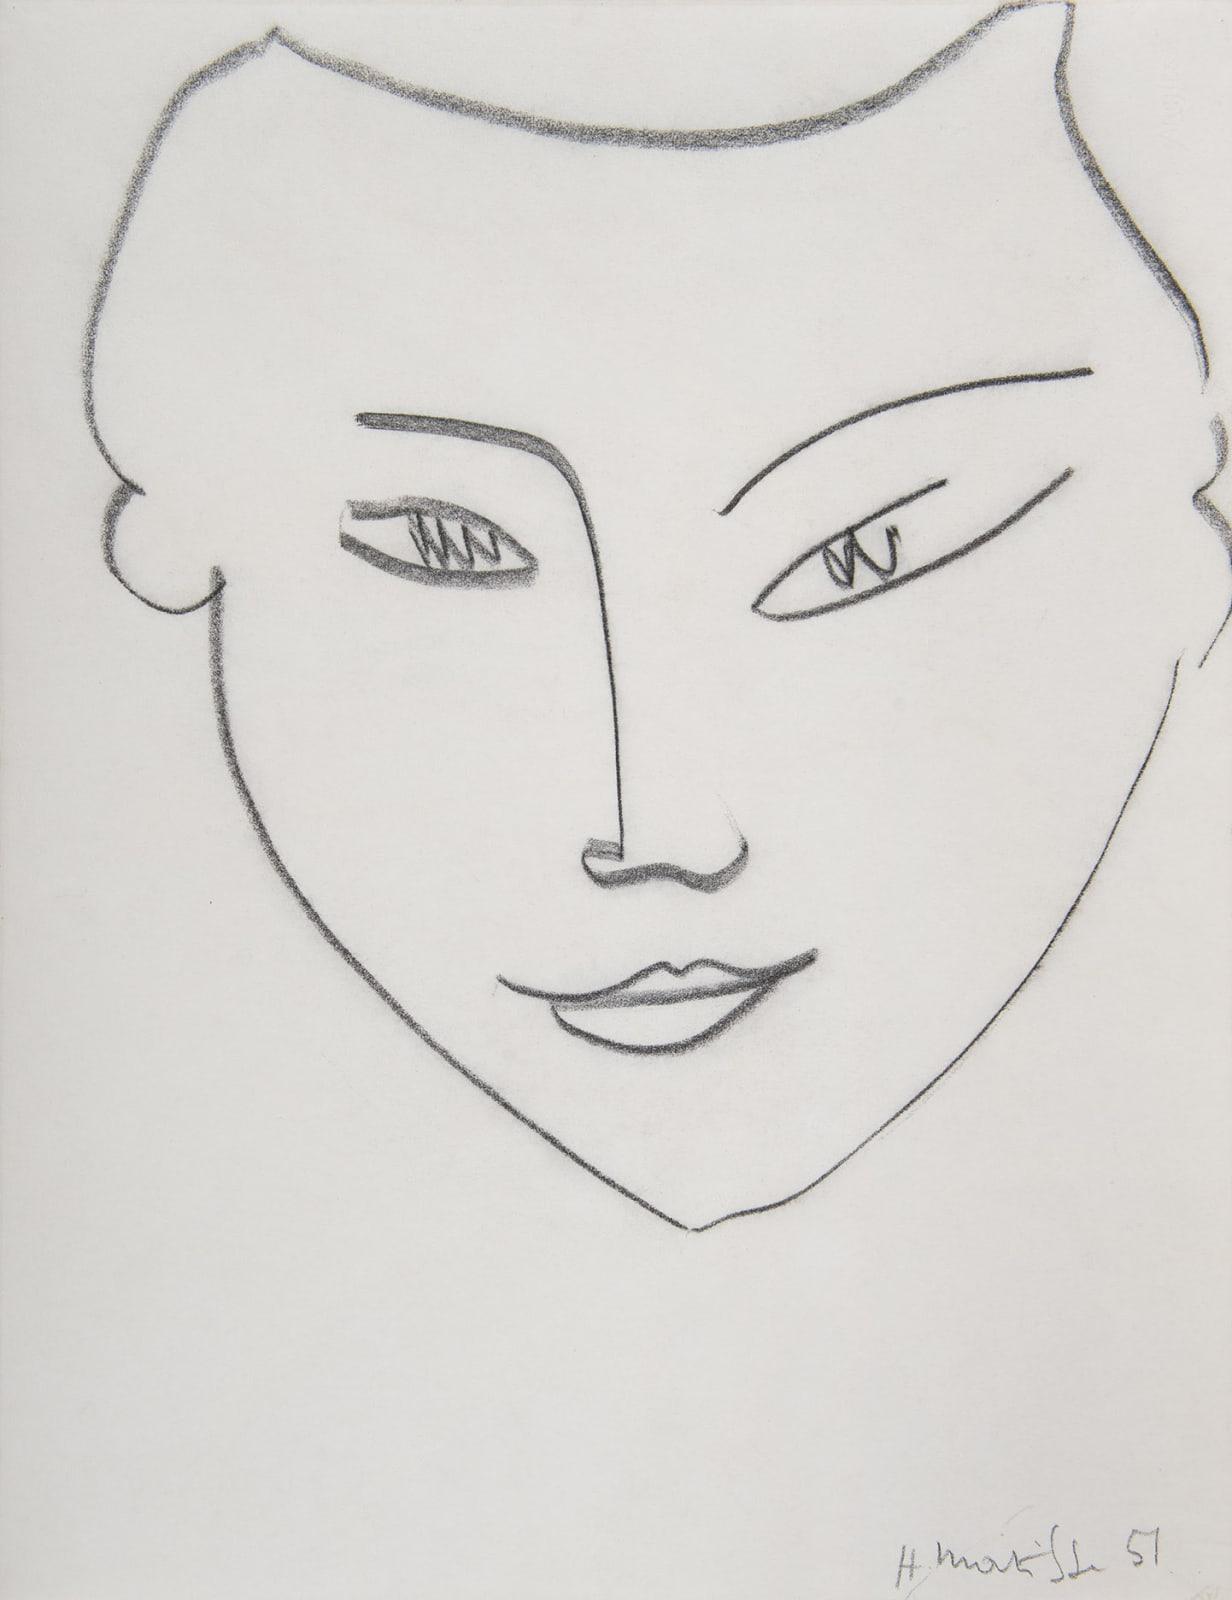 HENRI MATISSE, Visage de femme, 1951